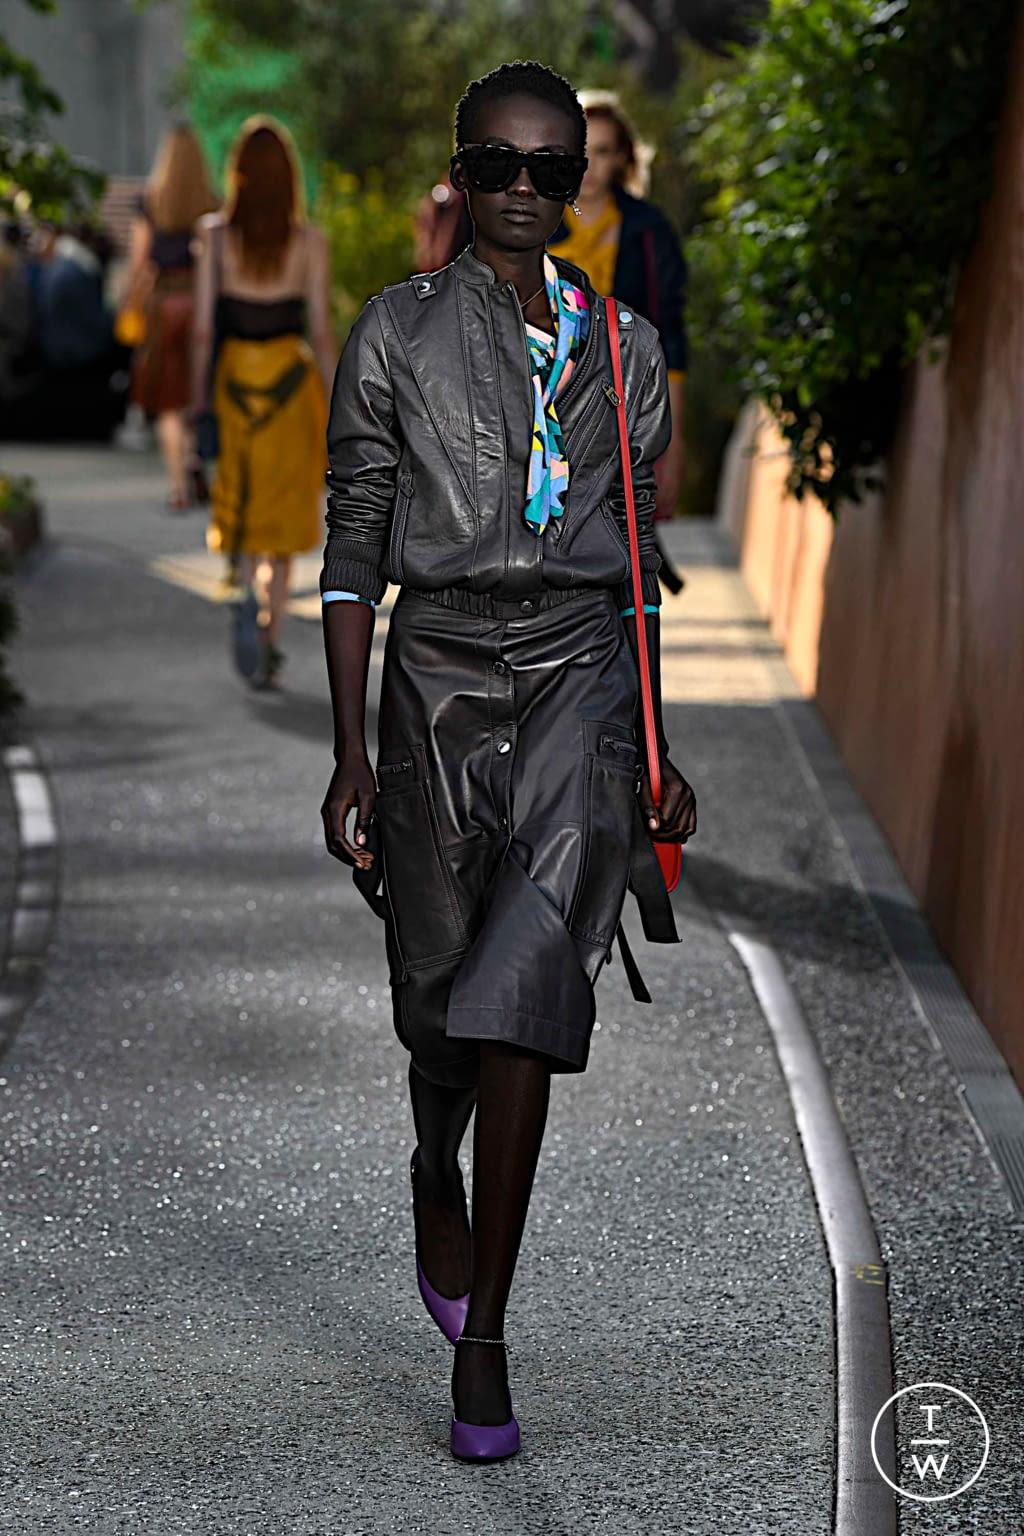 Fashion Week New York Spring/Summer 2020 look 29 de la collection Coach 1941 womenswear